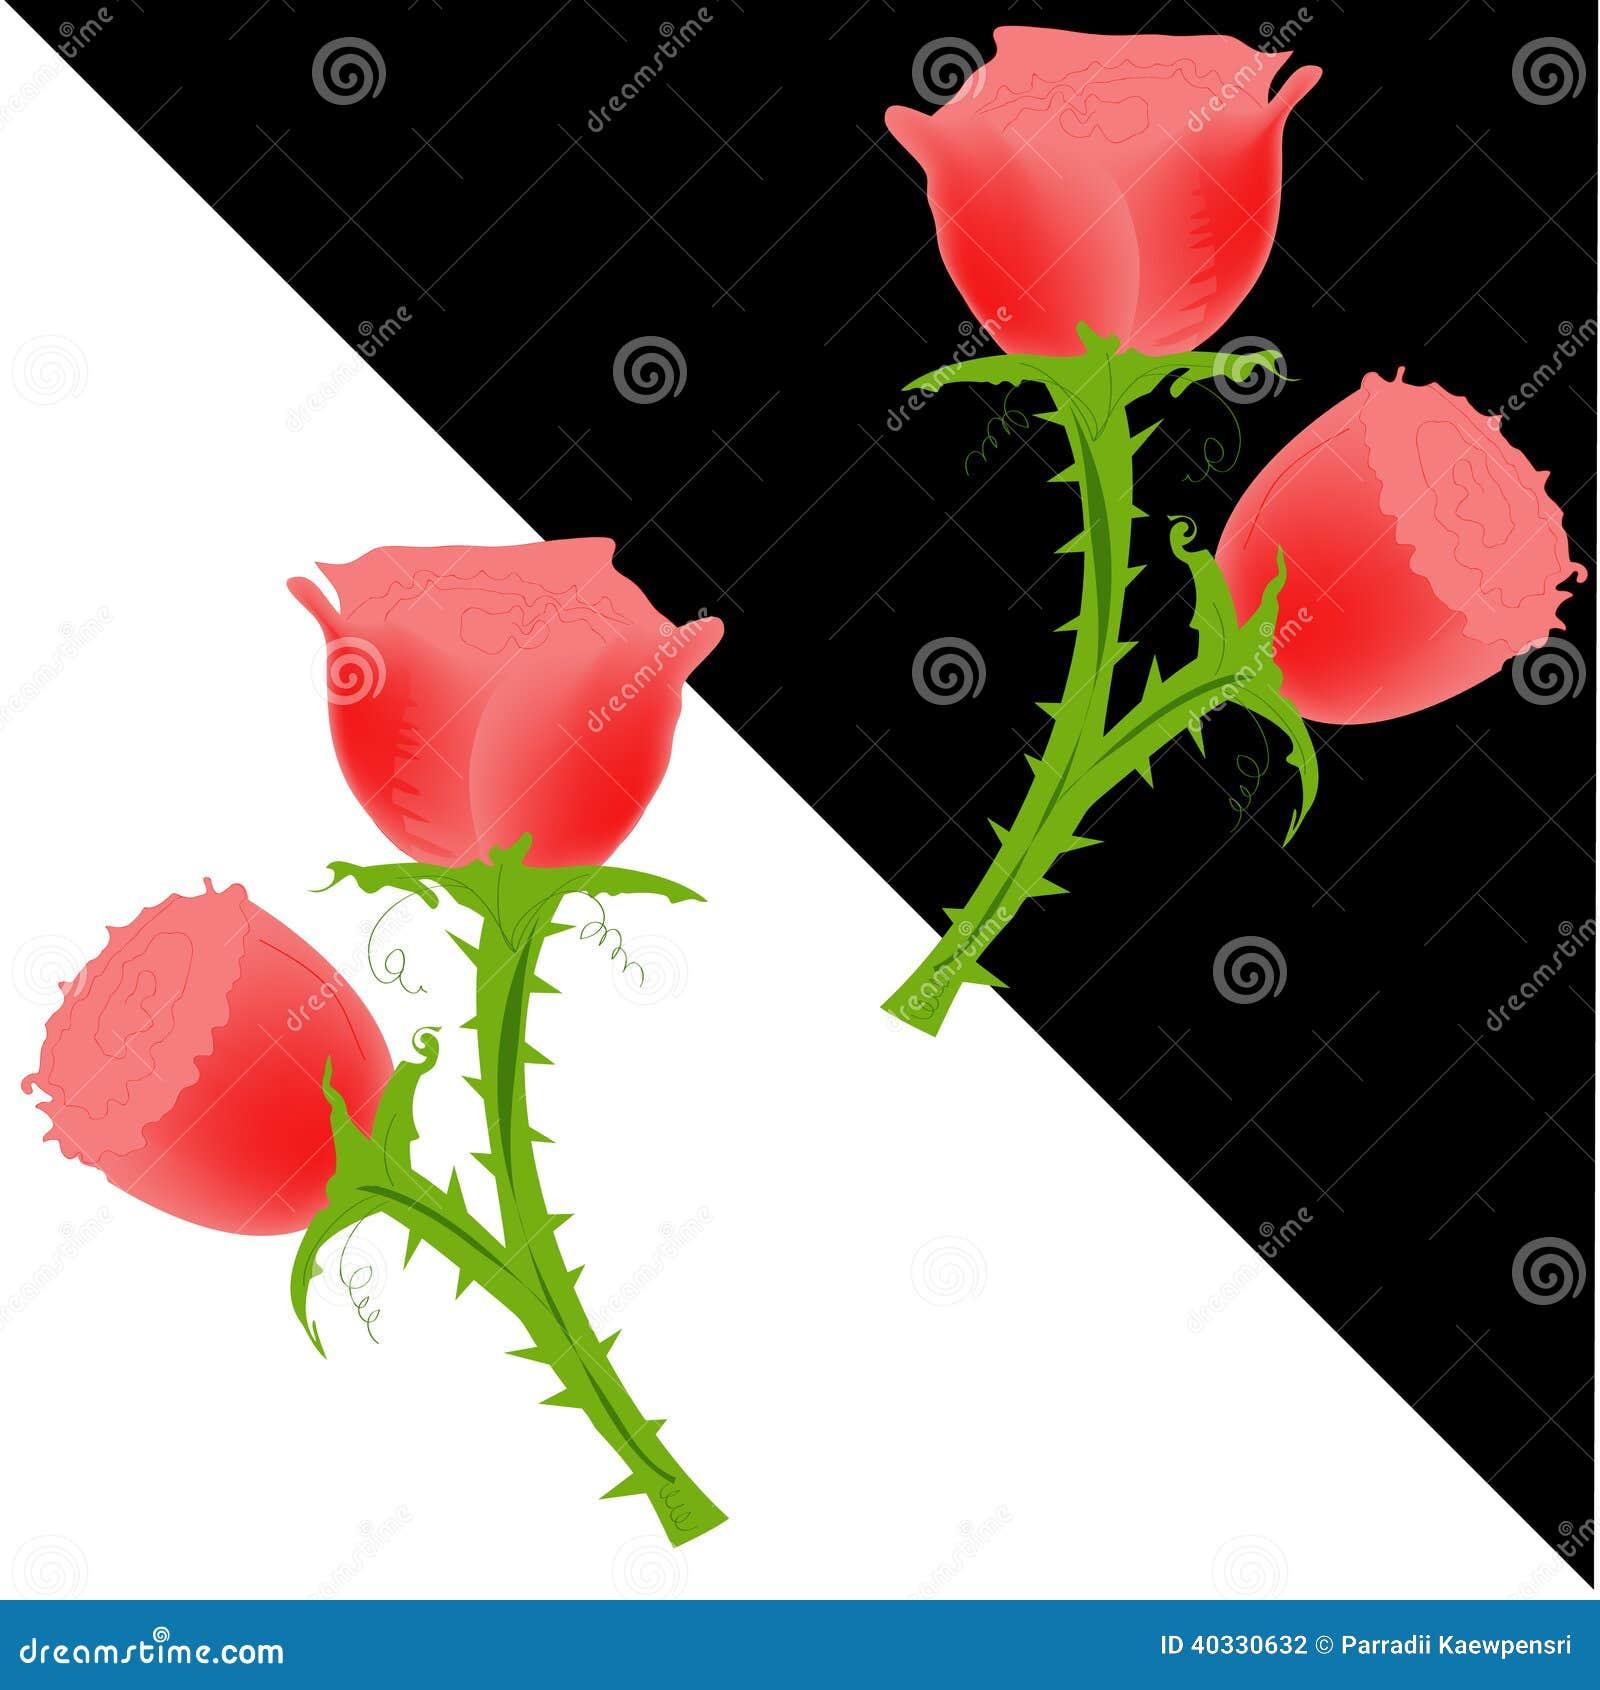 Red Rose Wallpaper Stock Vector Illustration Of Illustration 40330632